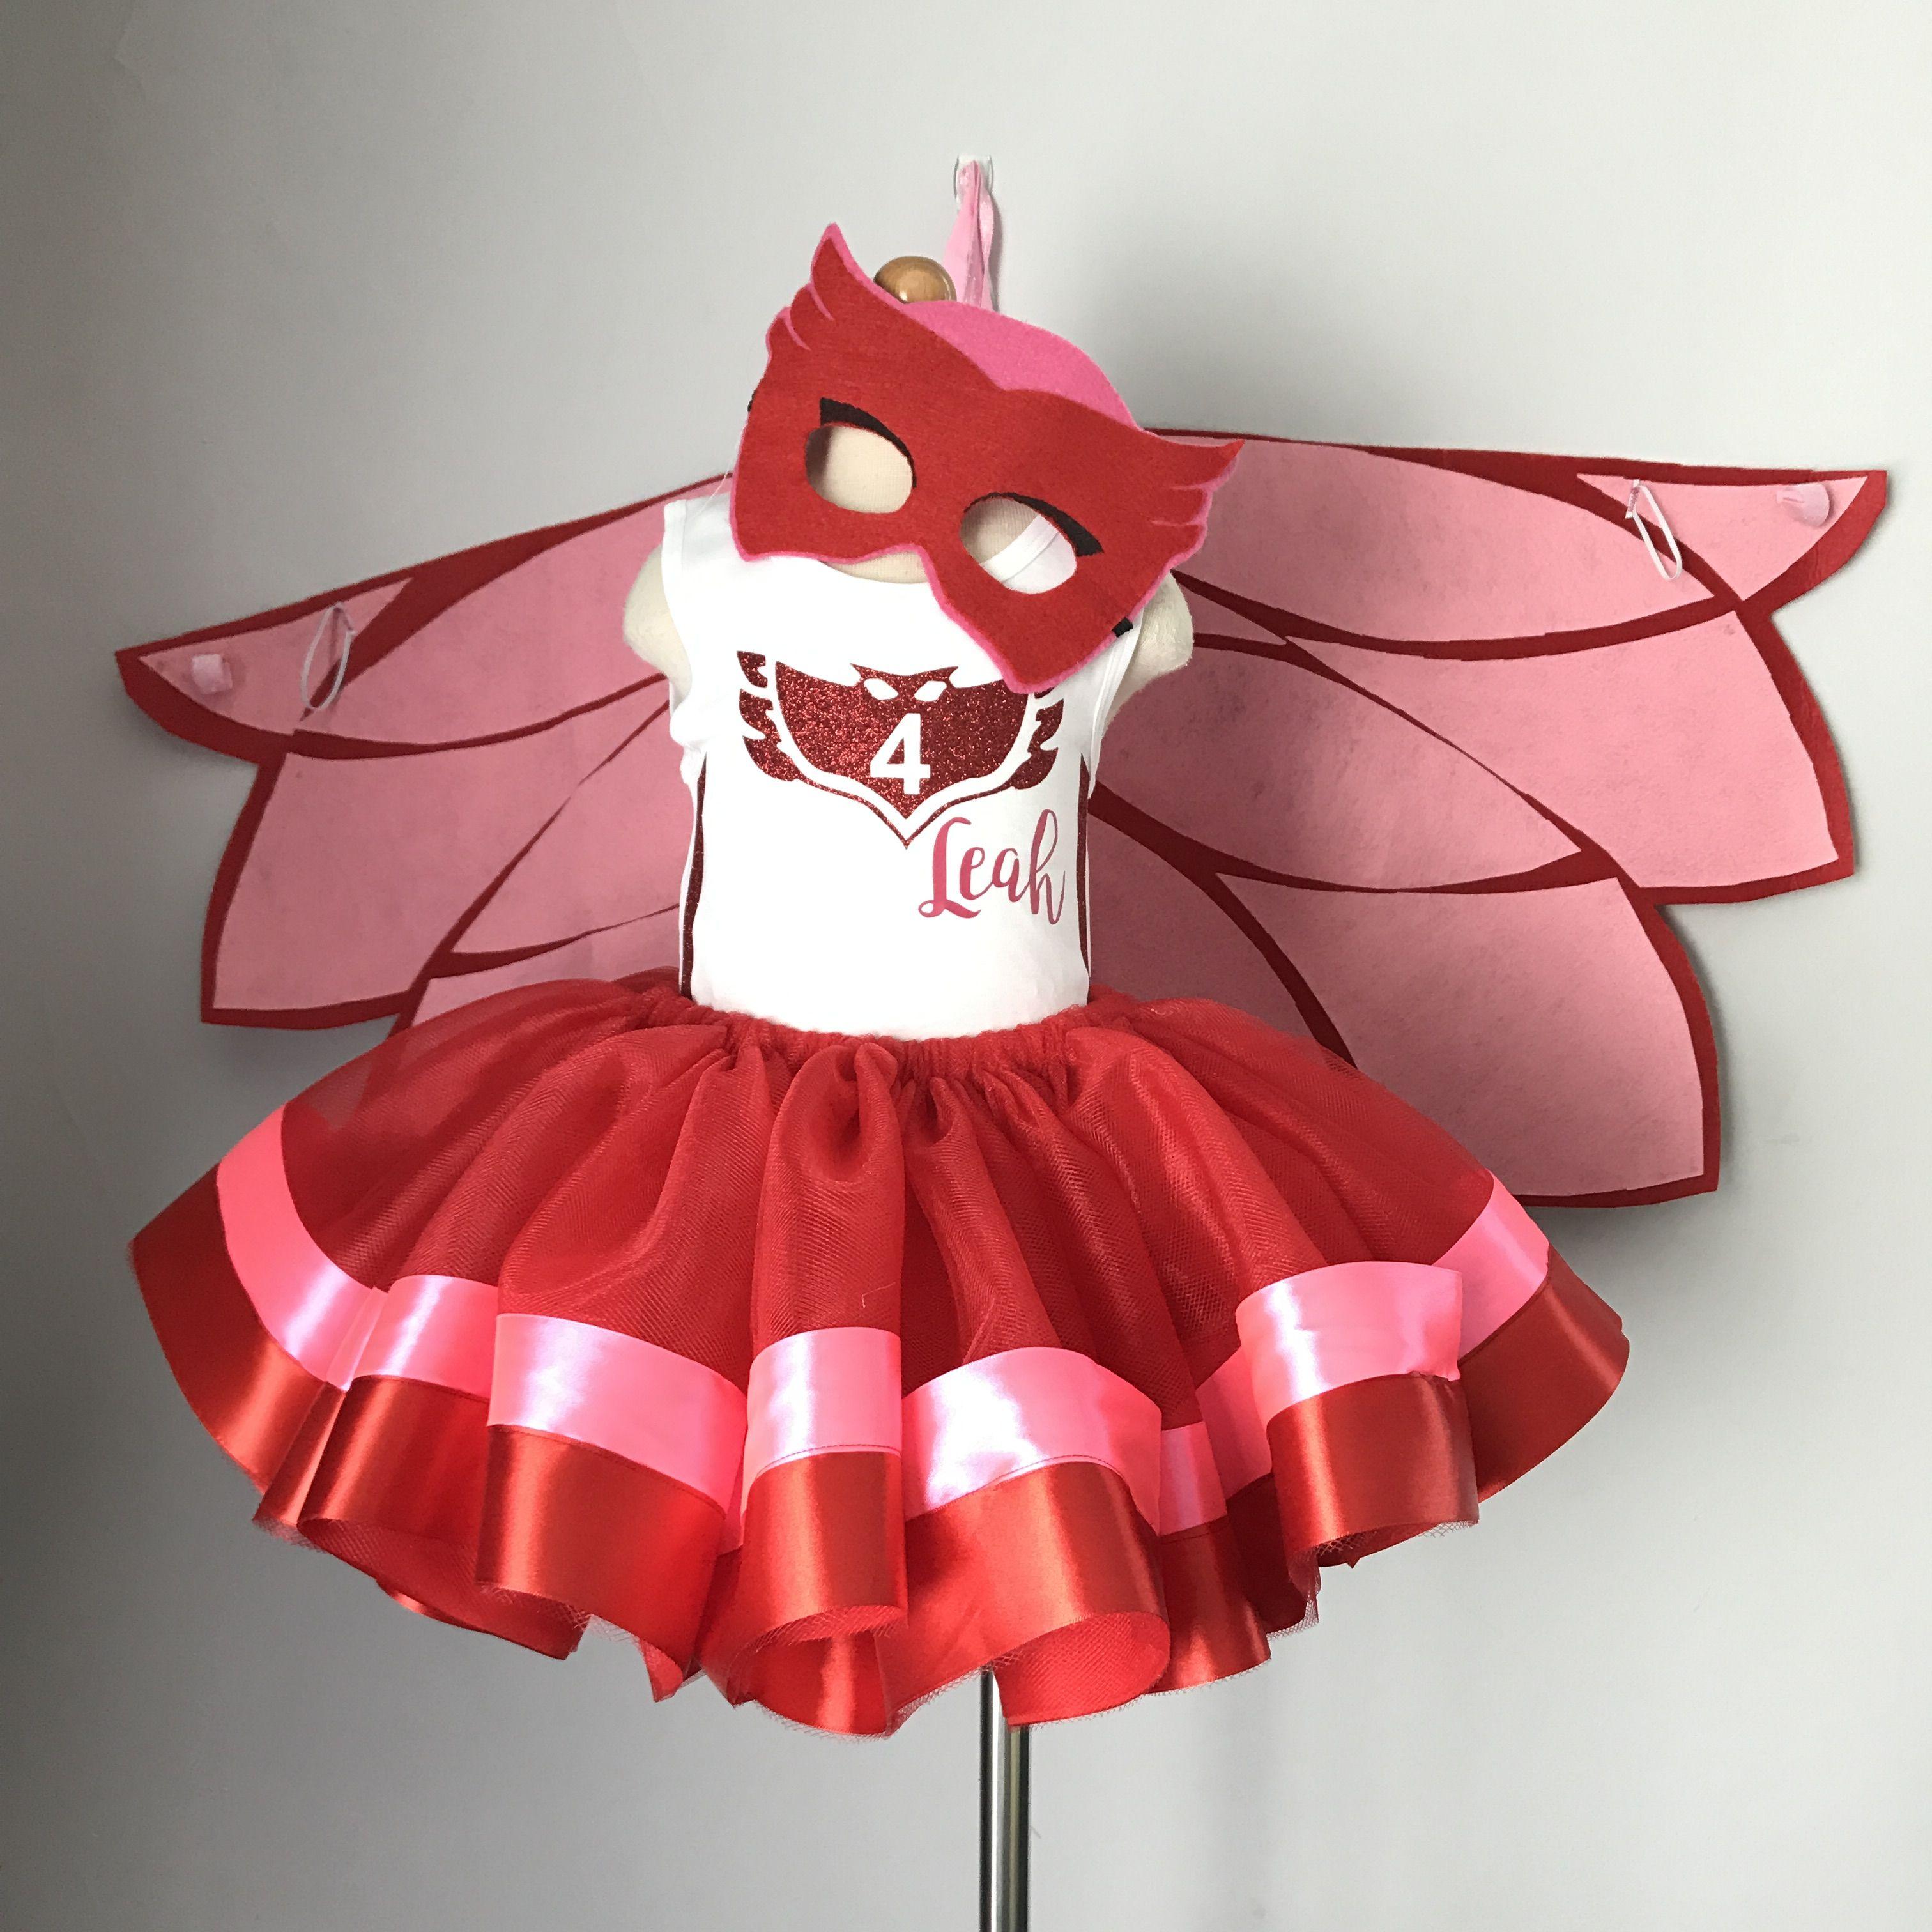 PJ Masks inspired tutu outfit - Owlette tutu skirt b74519ddd55